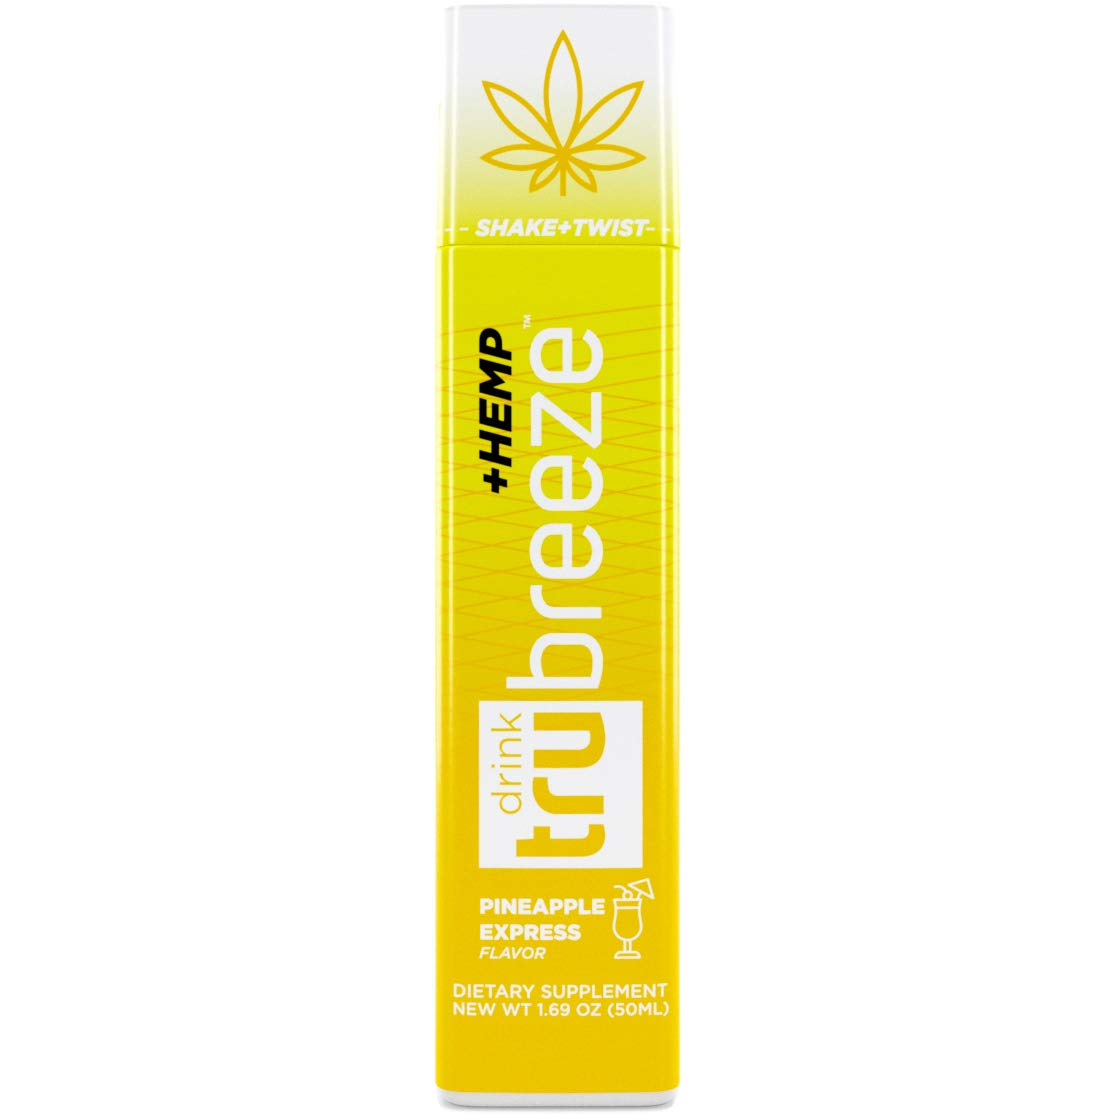 Tru Breeze Drink - Natural Keto Relaxation Supplement Plus Hemp - Flavored Pineapple Express (12) by TruEnergy